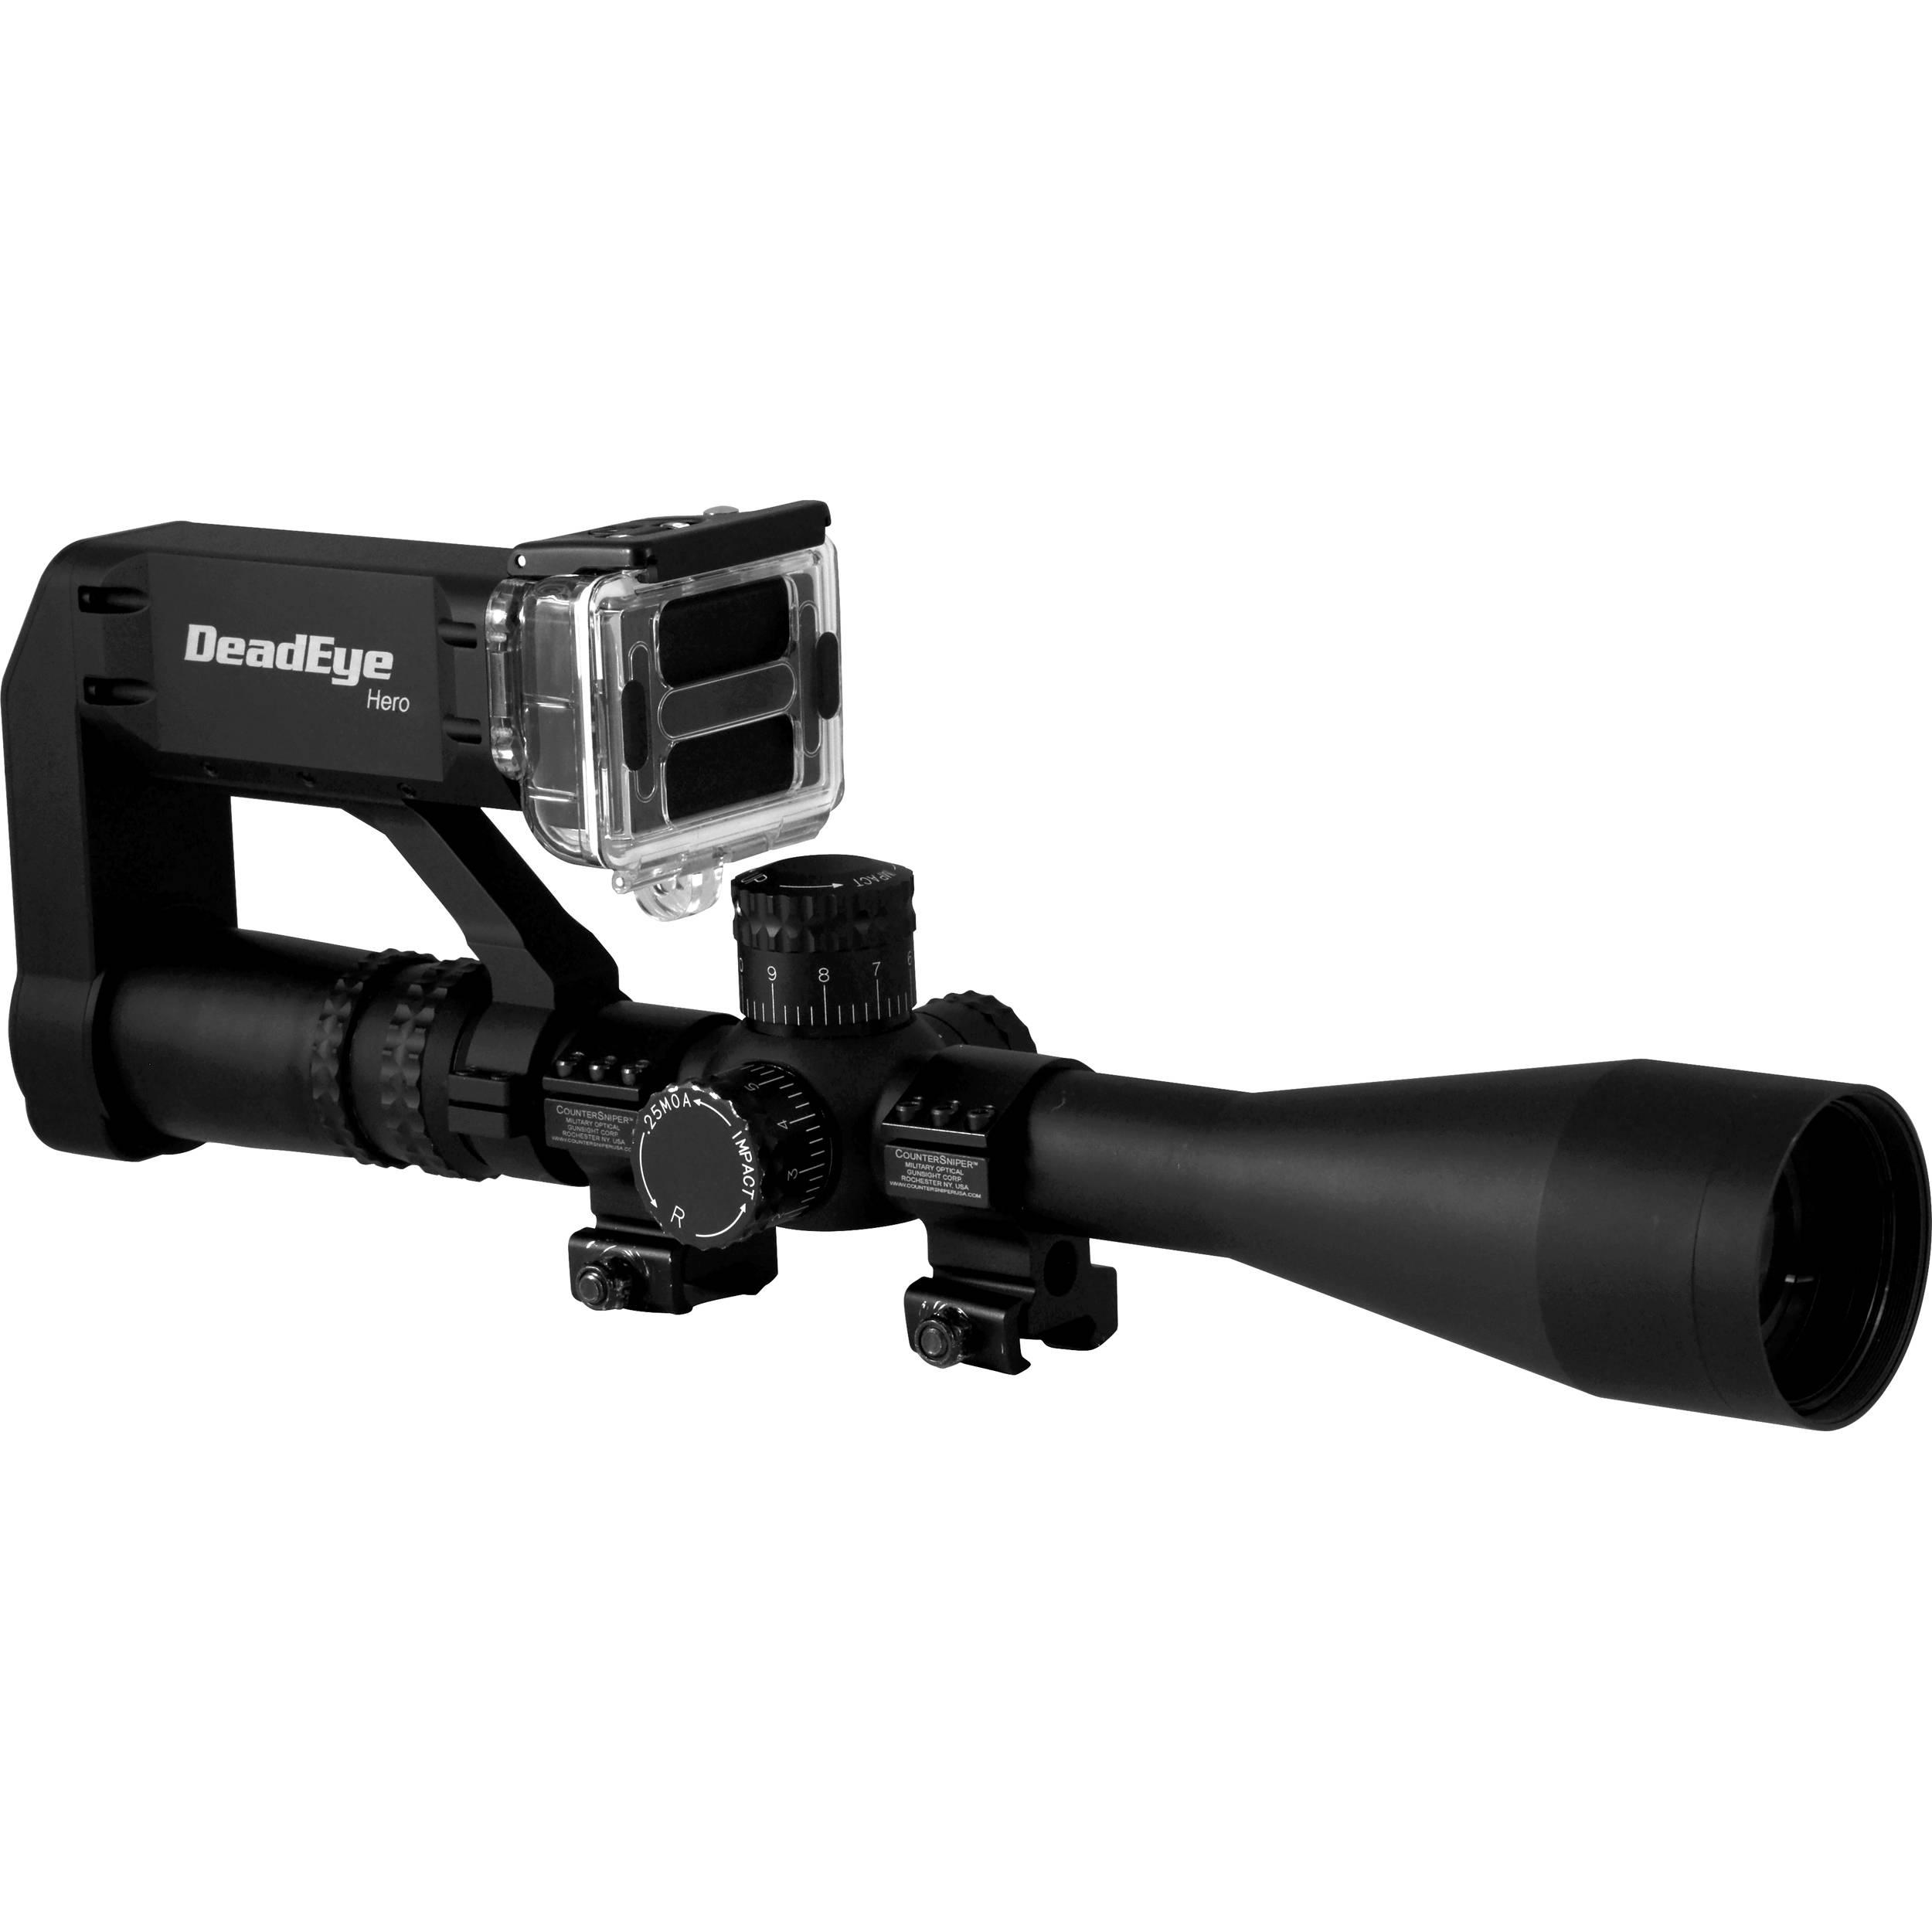 Oscilloscope With Camera Mount : Torrey pines logic deadeye scope mount tp o de gs n b h